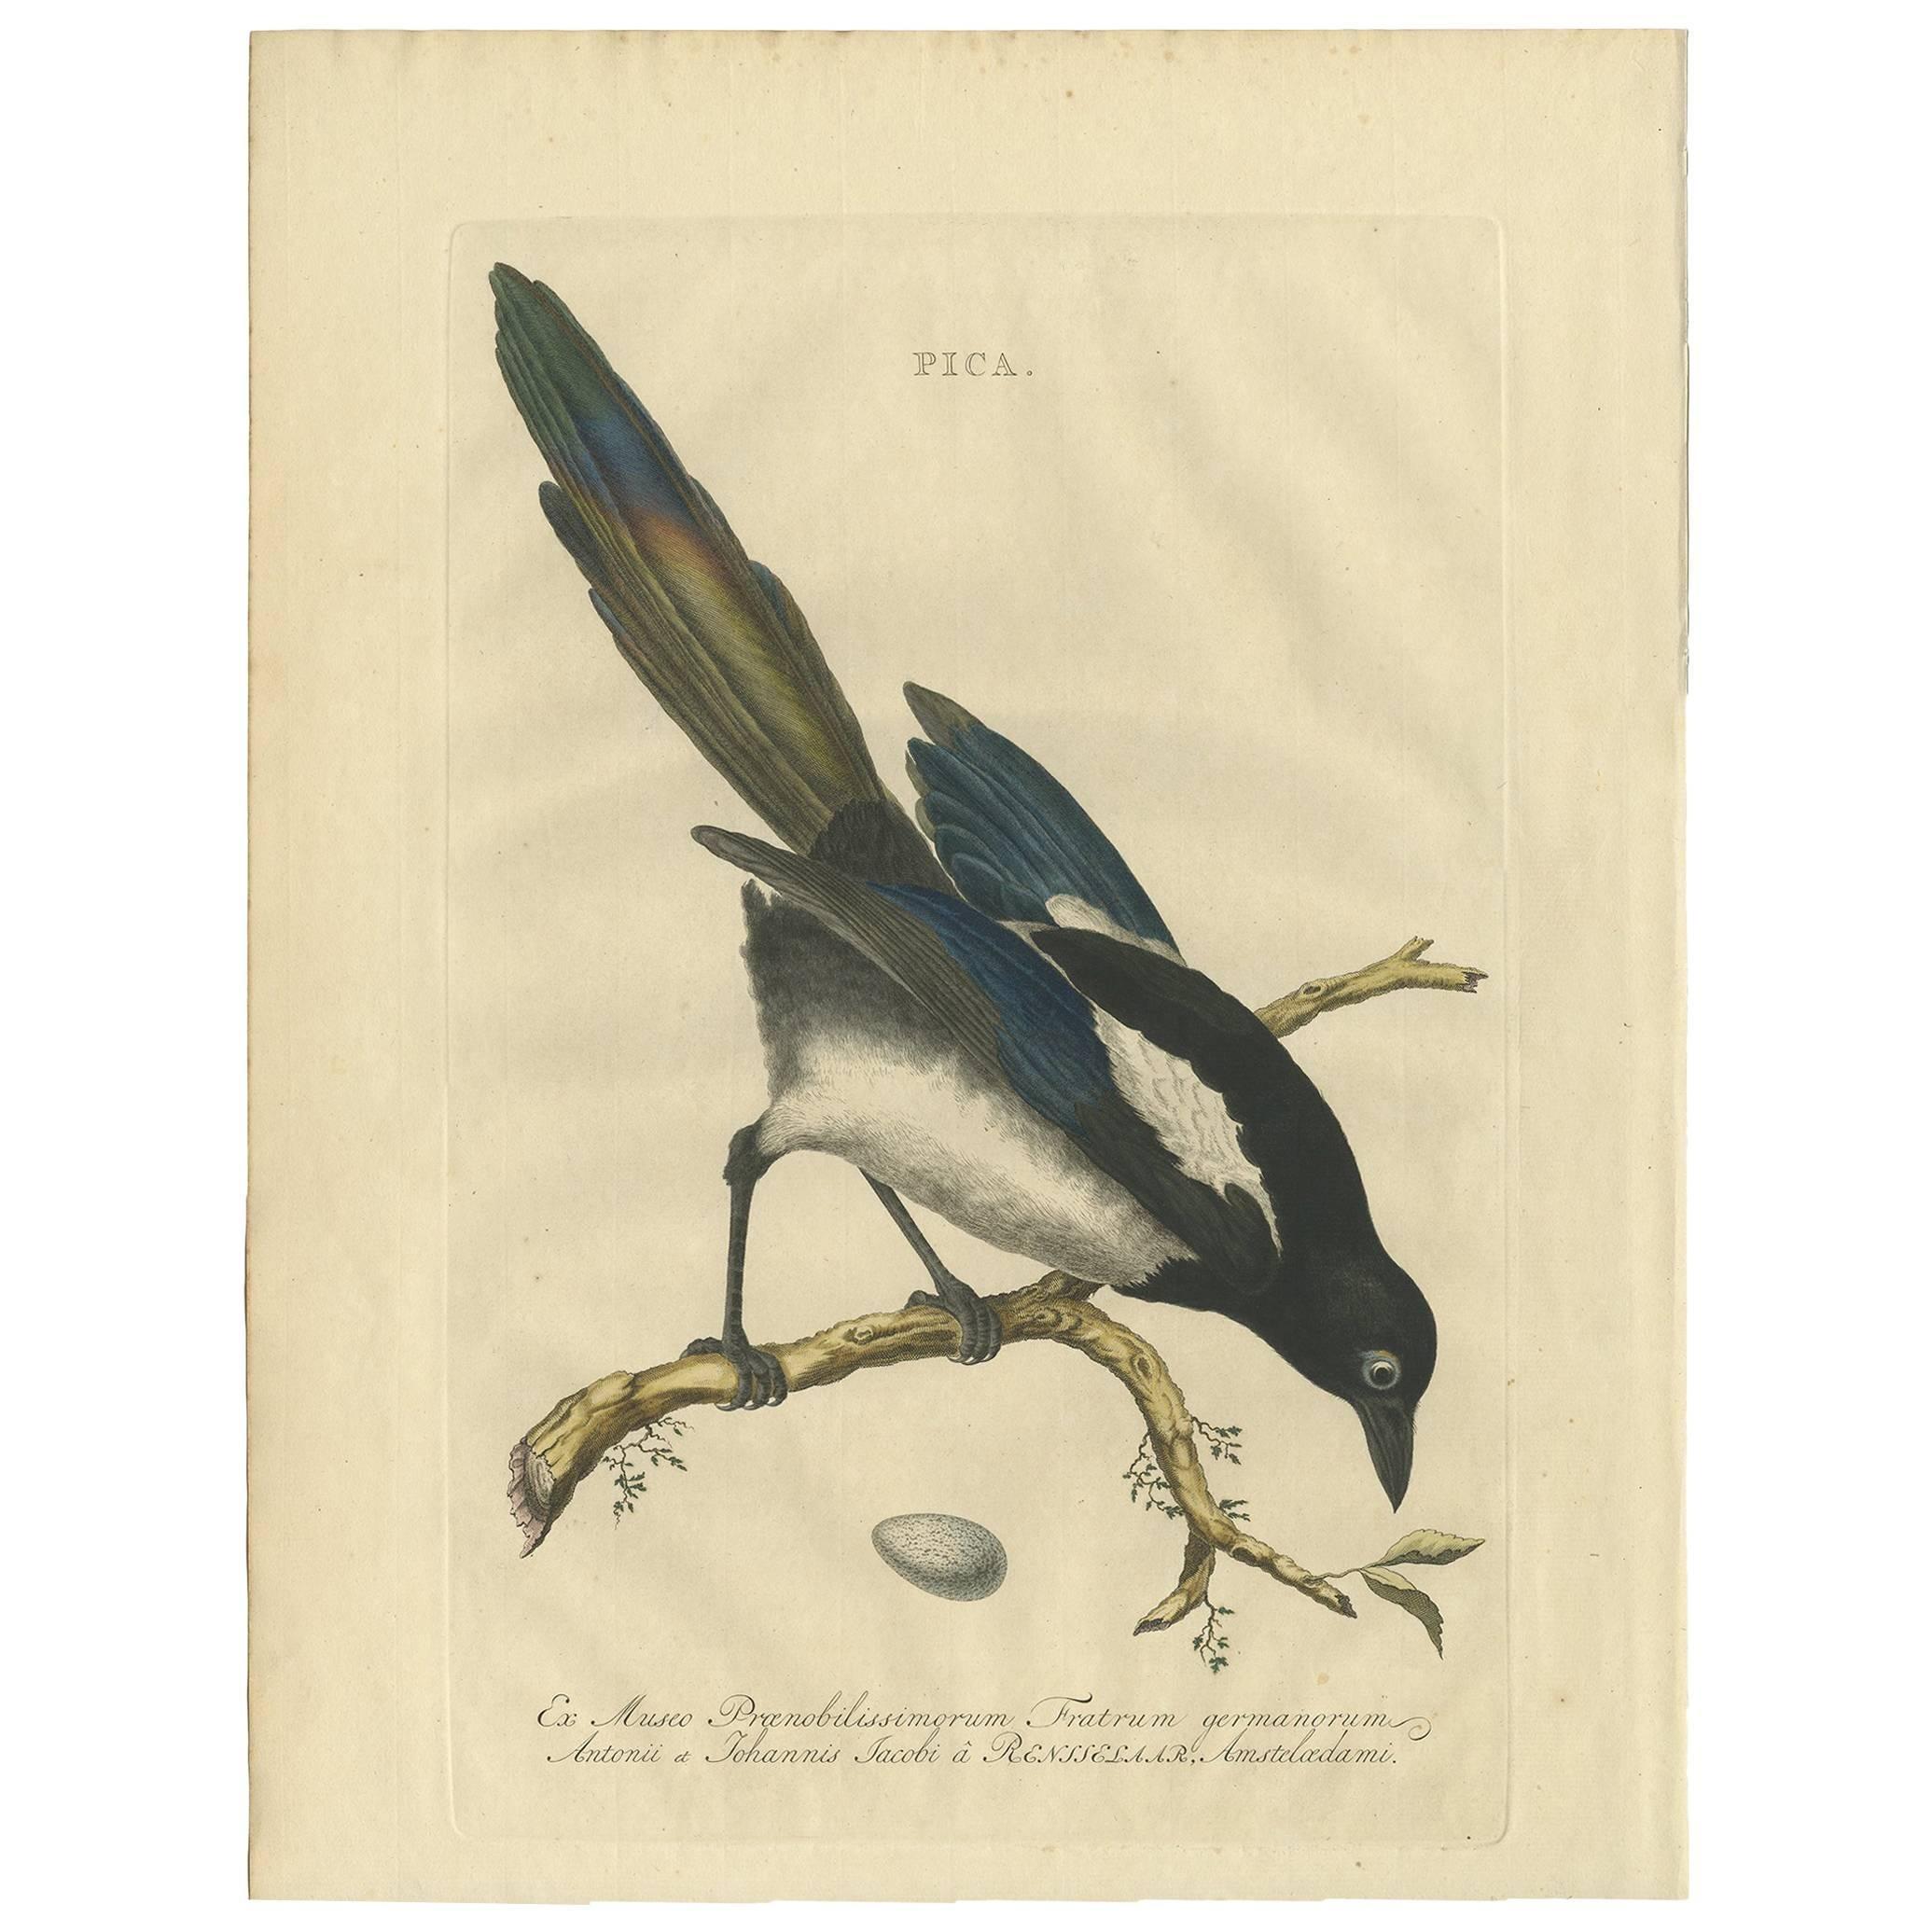 Antique Bird Print of the Magpie by Sepp & Nozeman, 1770